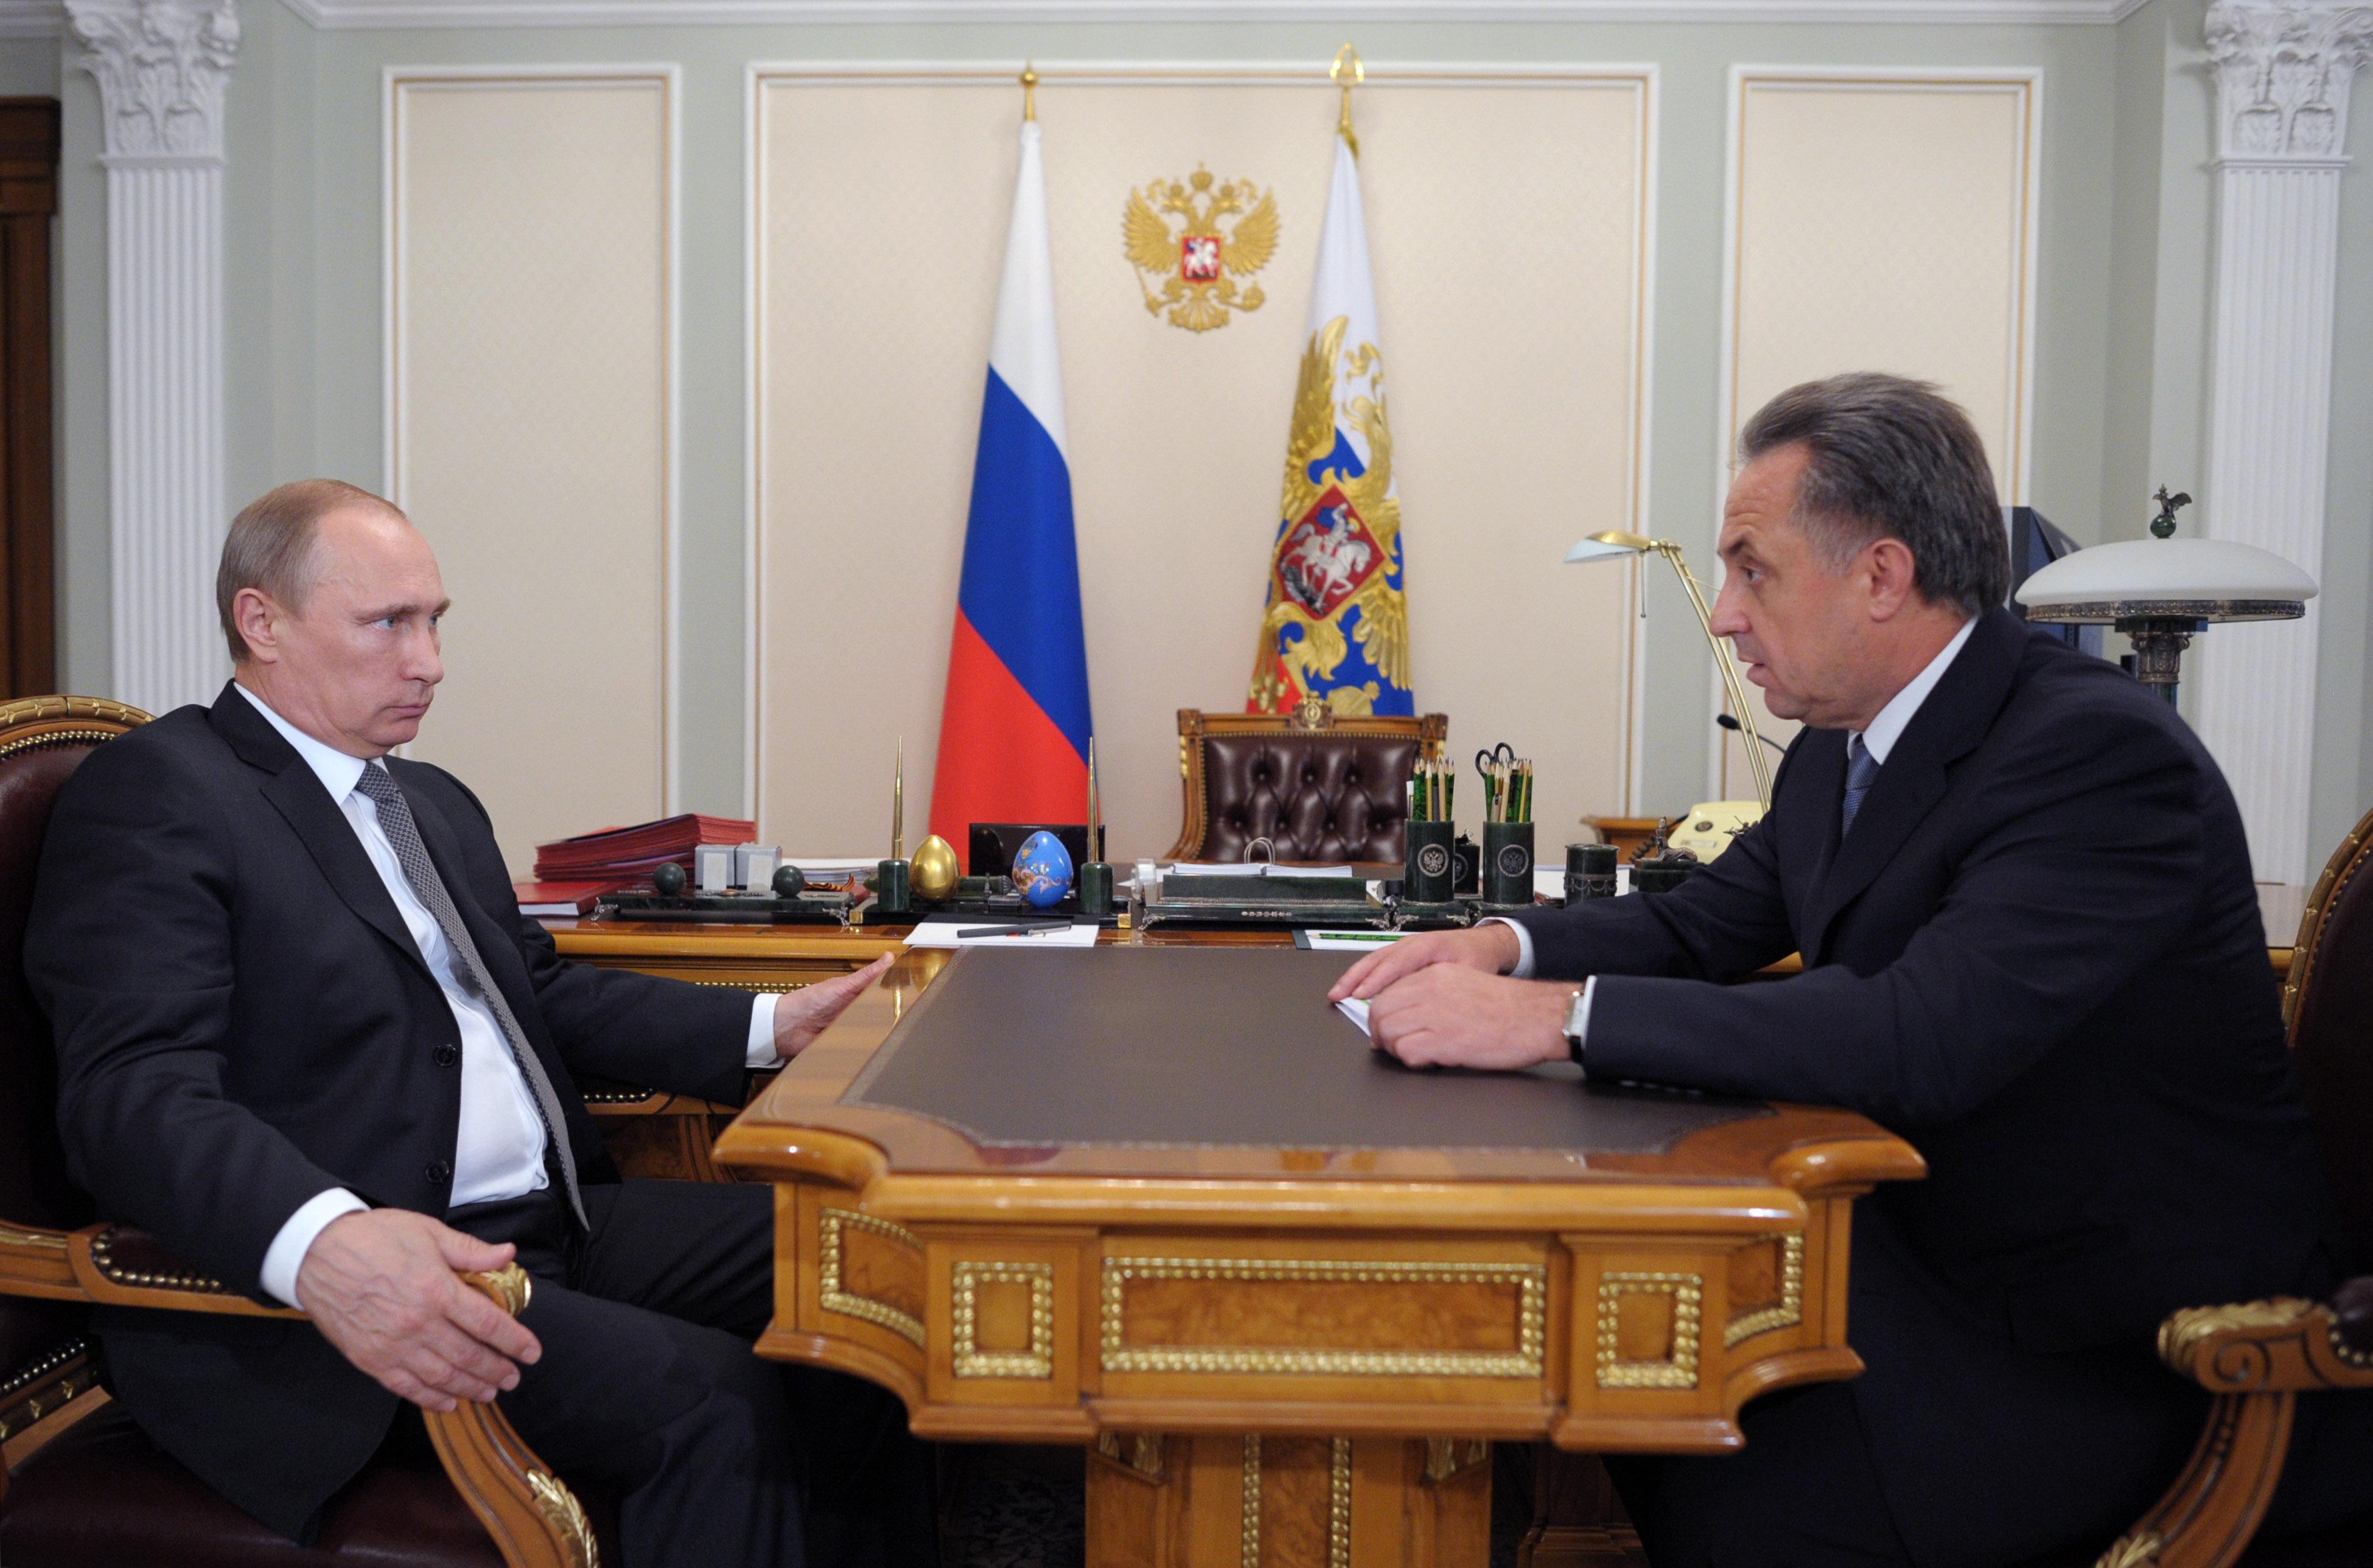 Президент России Владимир Путин и министр спорта РФ Виталий Мутко во время встречи